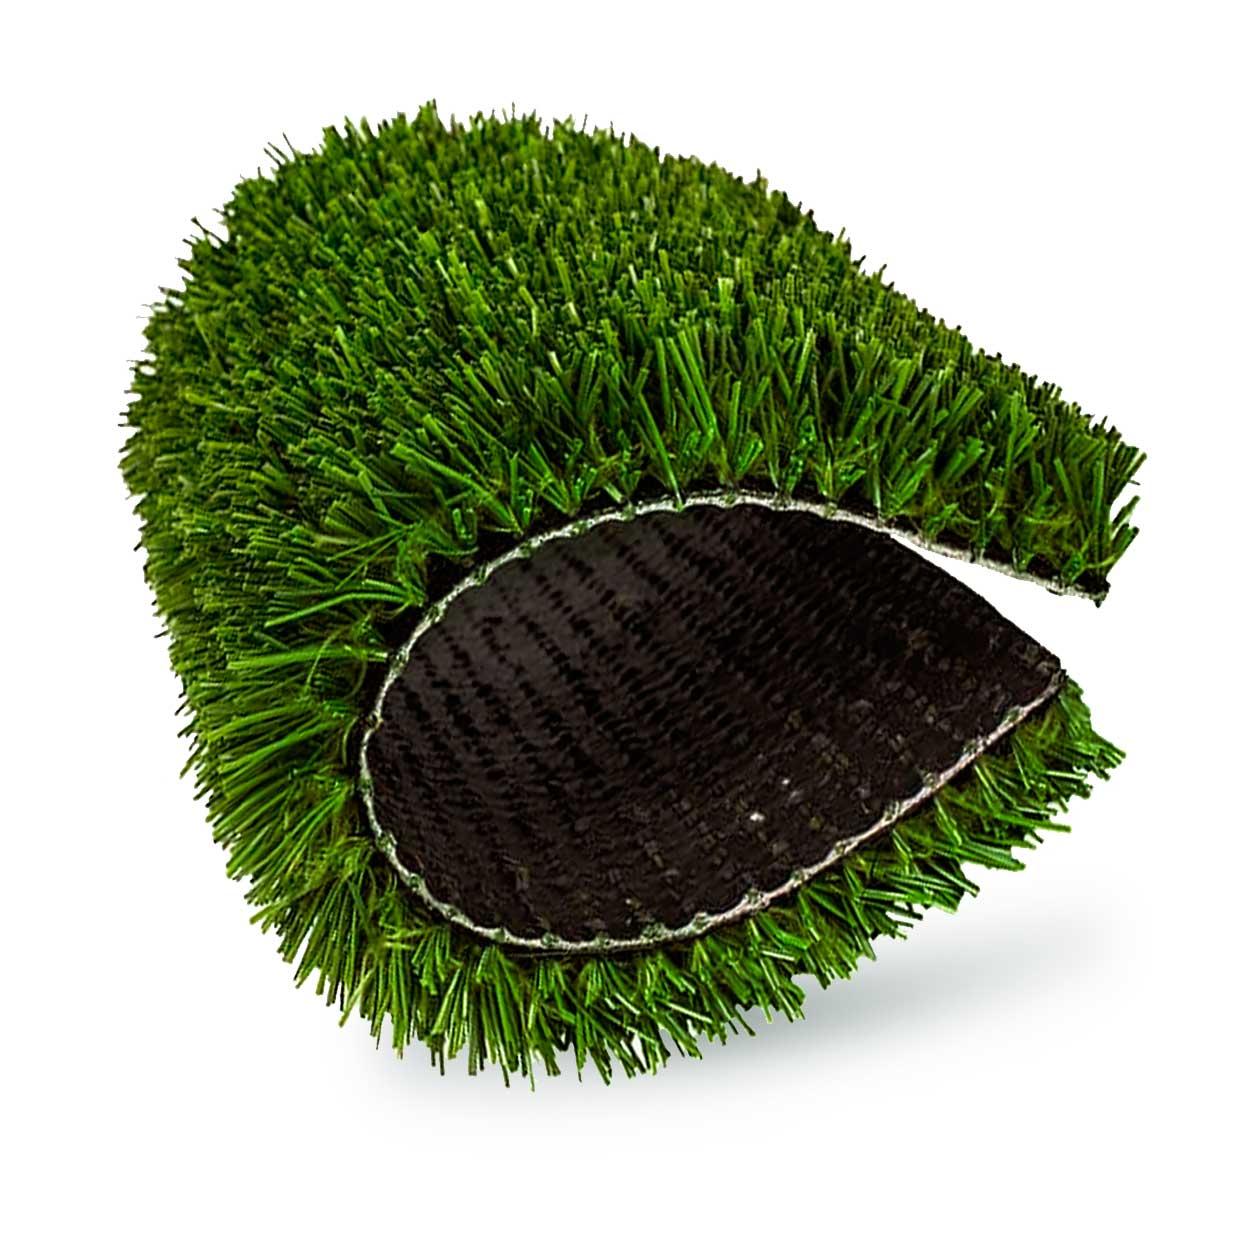 Grama Sintética XPlay Grass 22mm - 2x10m (20m²) - Verde